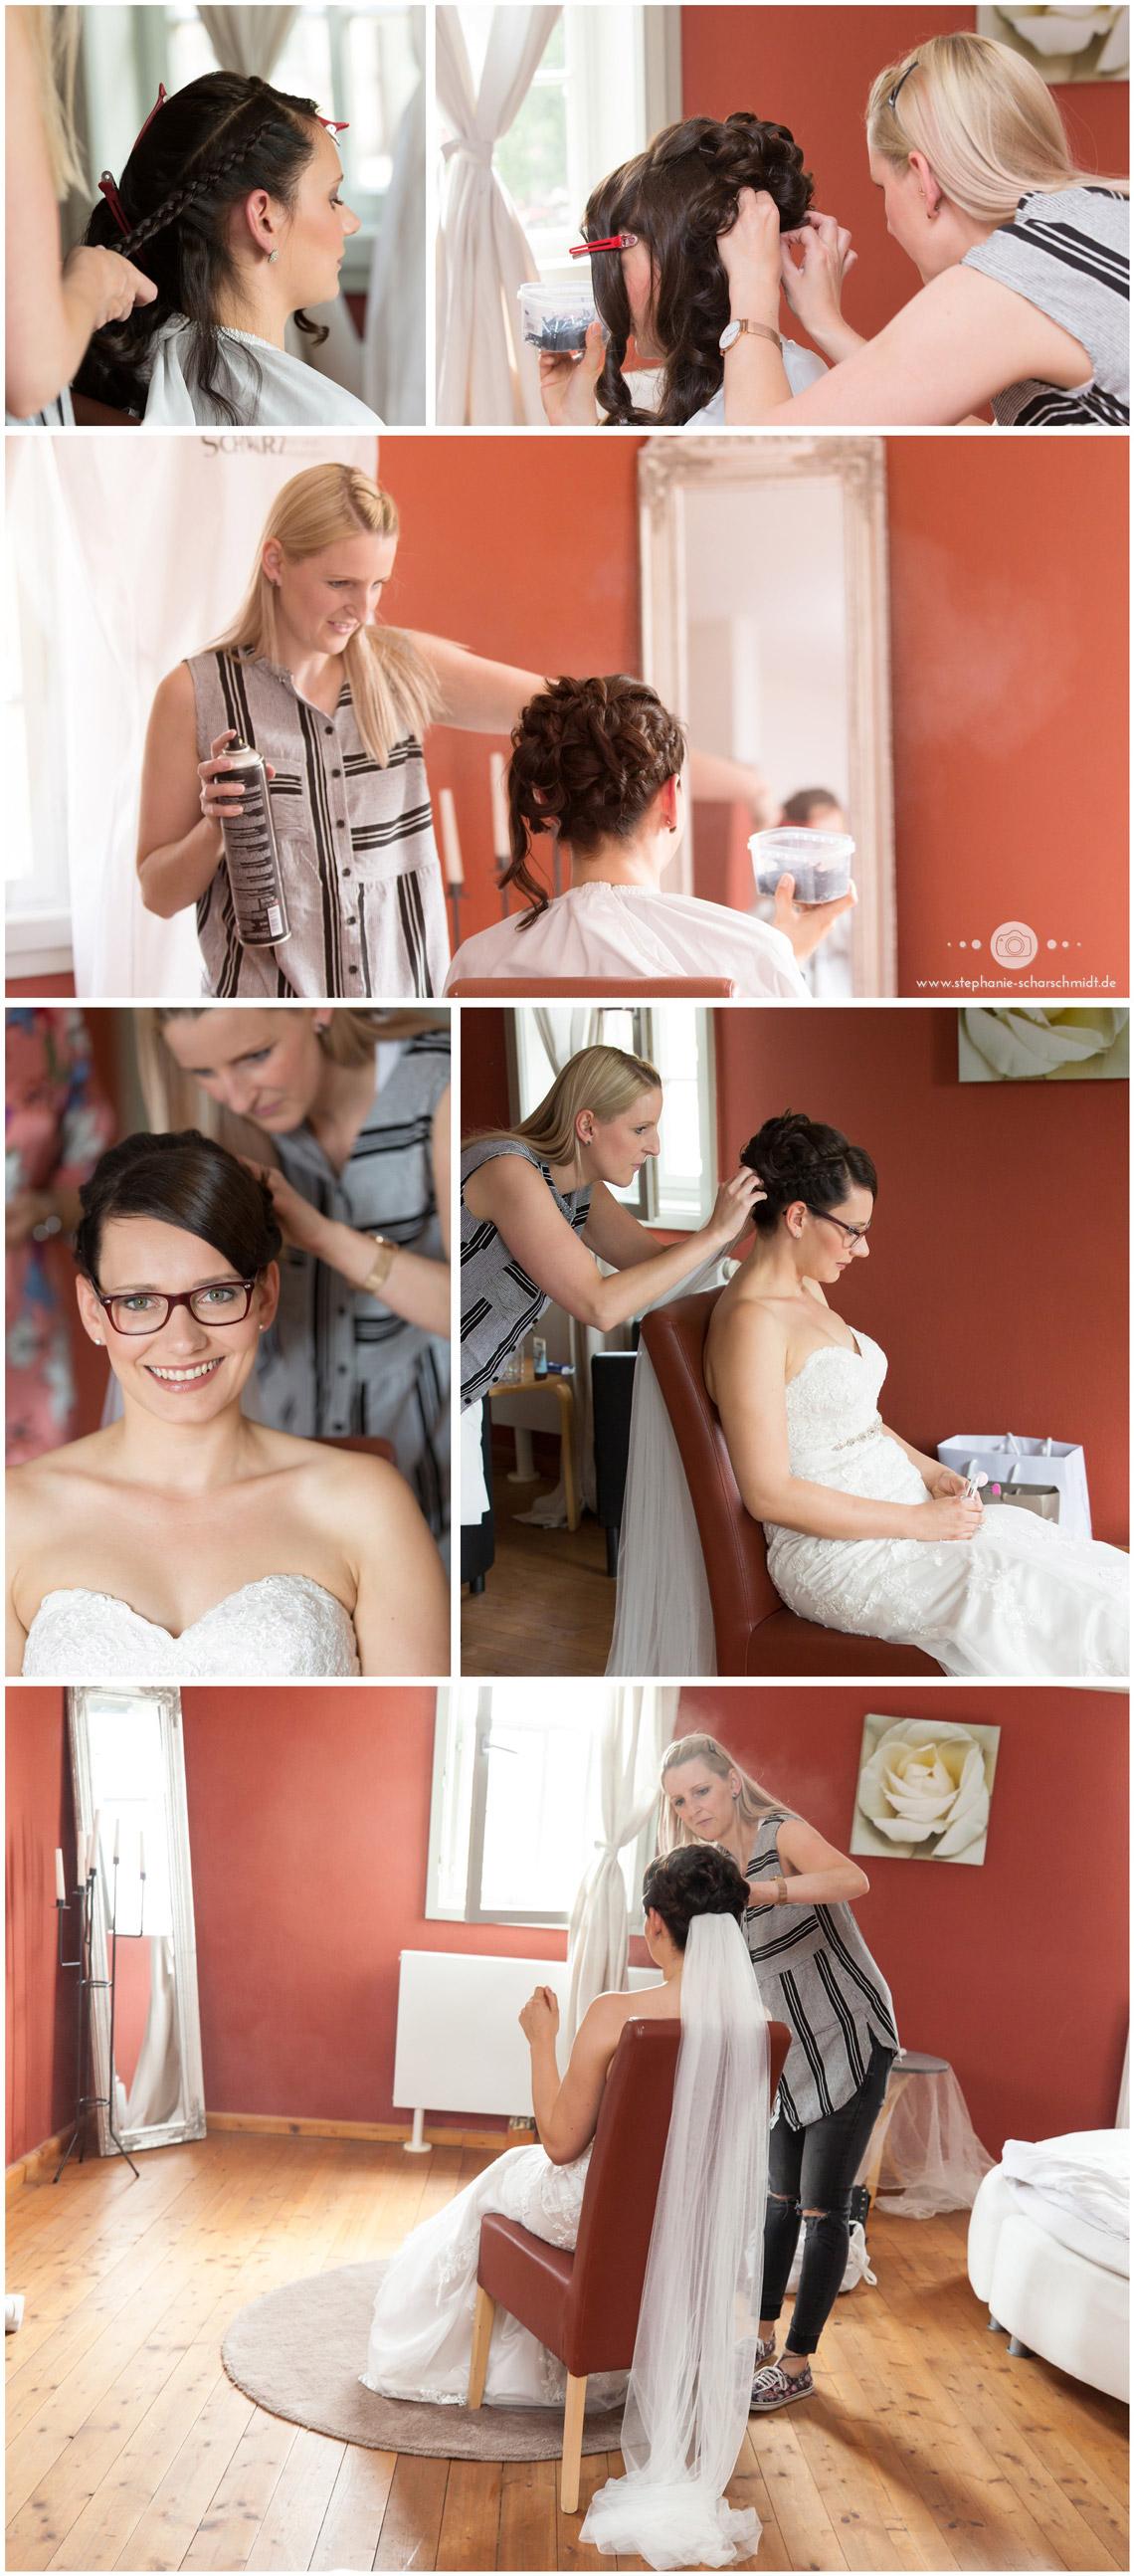 Hochzeitsfotograf Zwickau – Hochzeitsfotograf Stephanie Scharschmidt